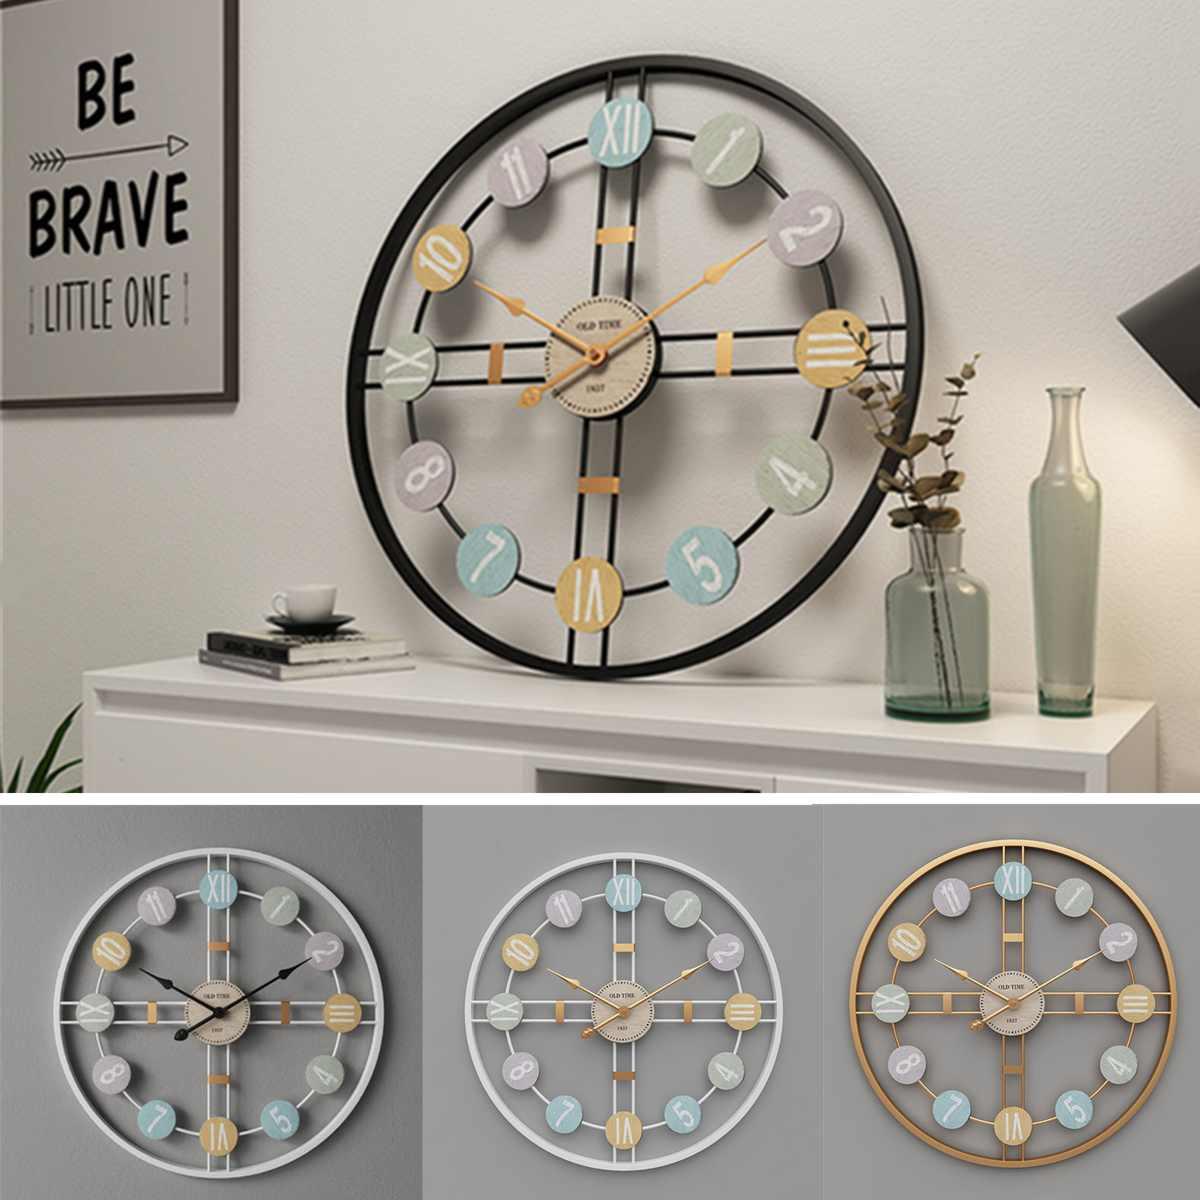 40CM Silent Round Wall Clock 3D Retro Nordic Metal Roman Numeral DIY Decor Luxury Wall Clock for Home Living Room Bar Cafe Decor